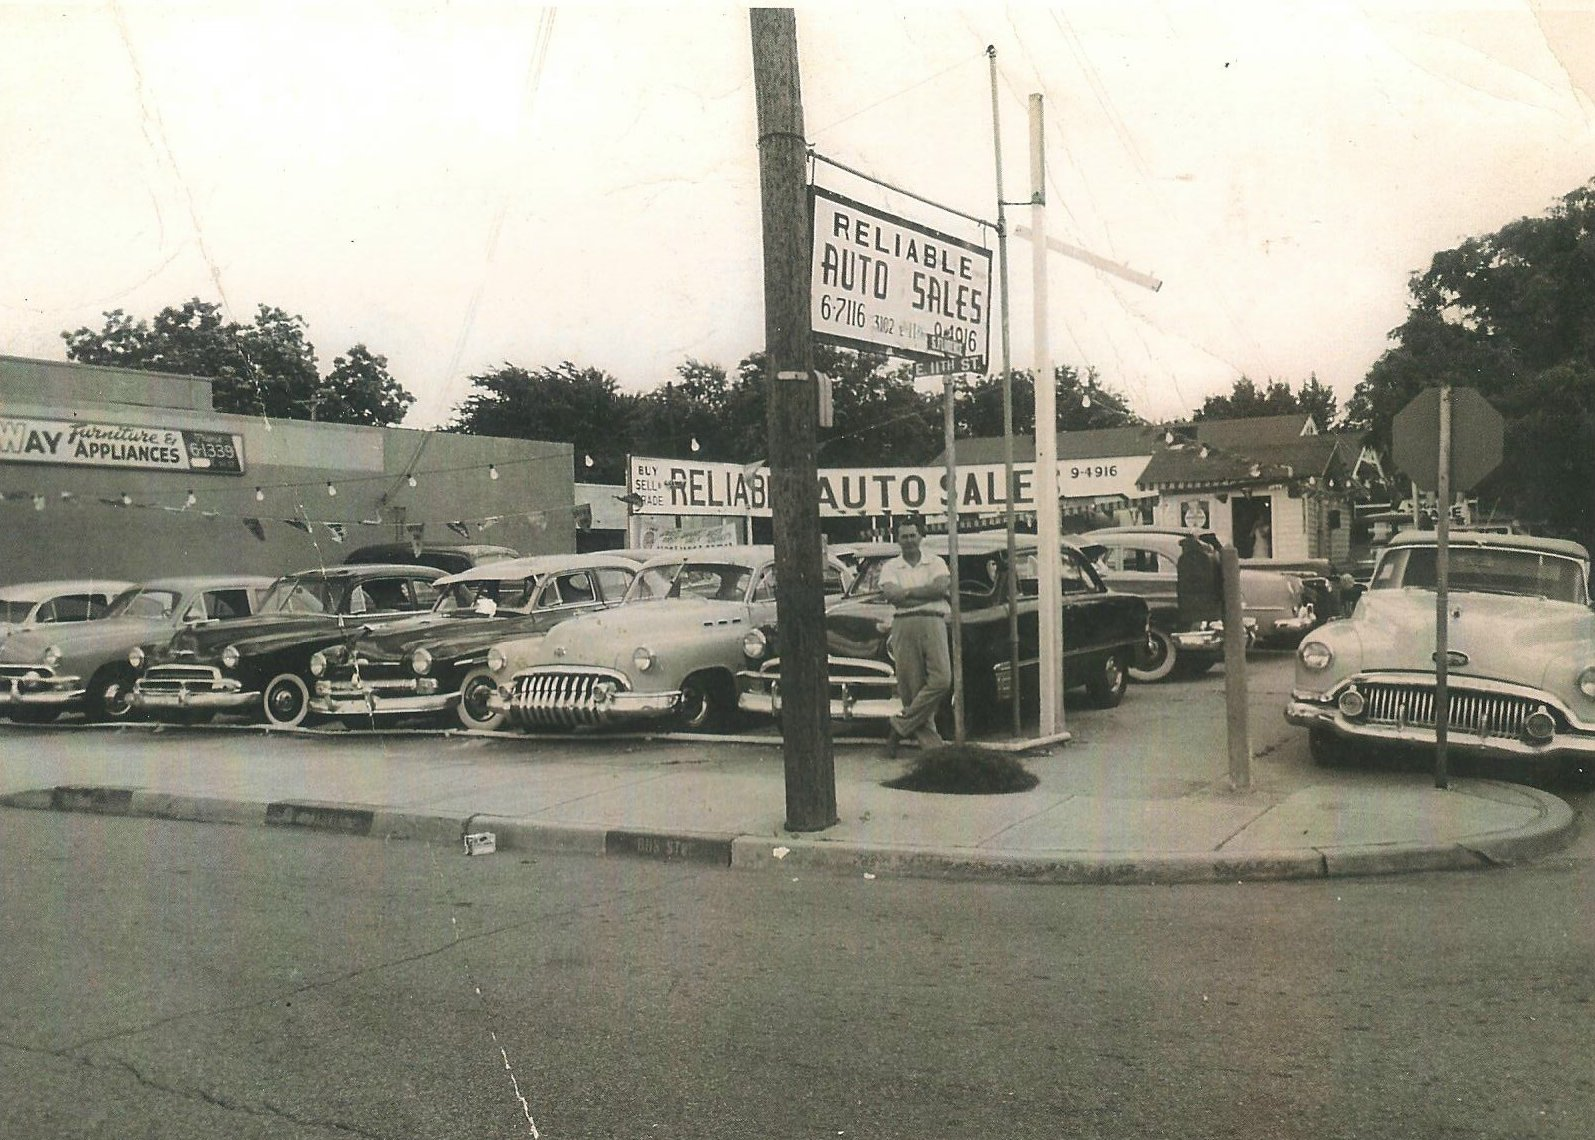 SOUTHSIDE AUCTION CO. - A SHORT HISTORY of SOUTHSIDE AUCTION CO.